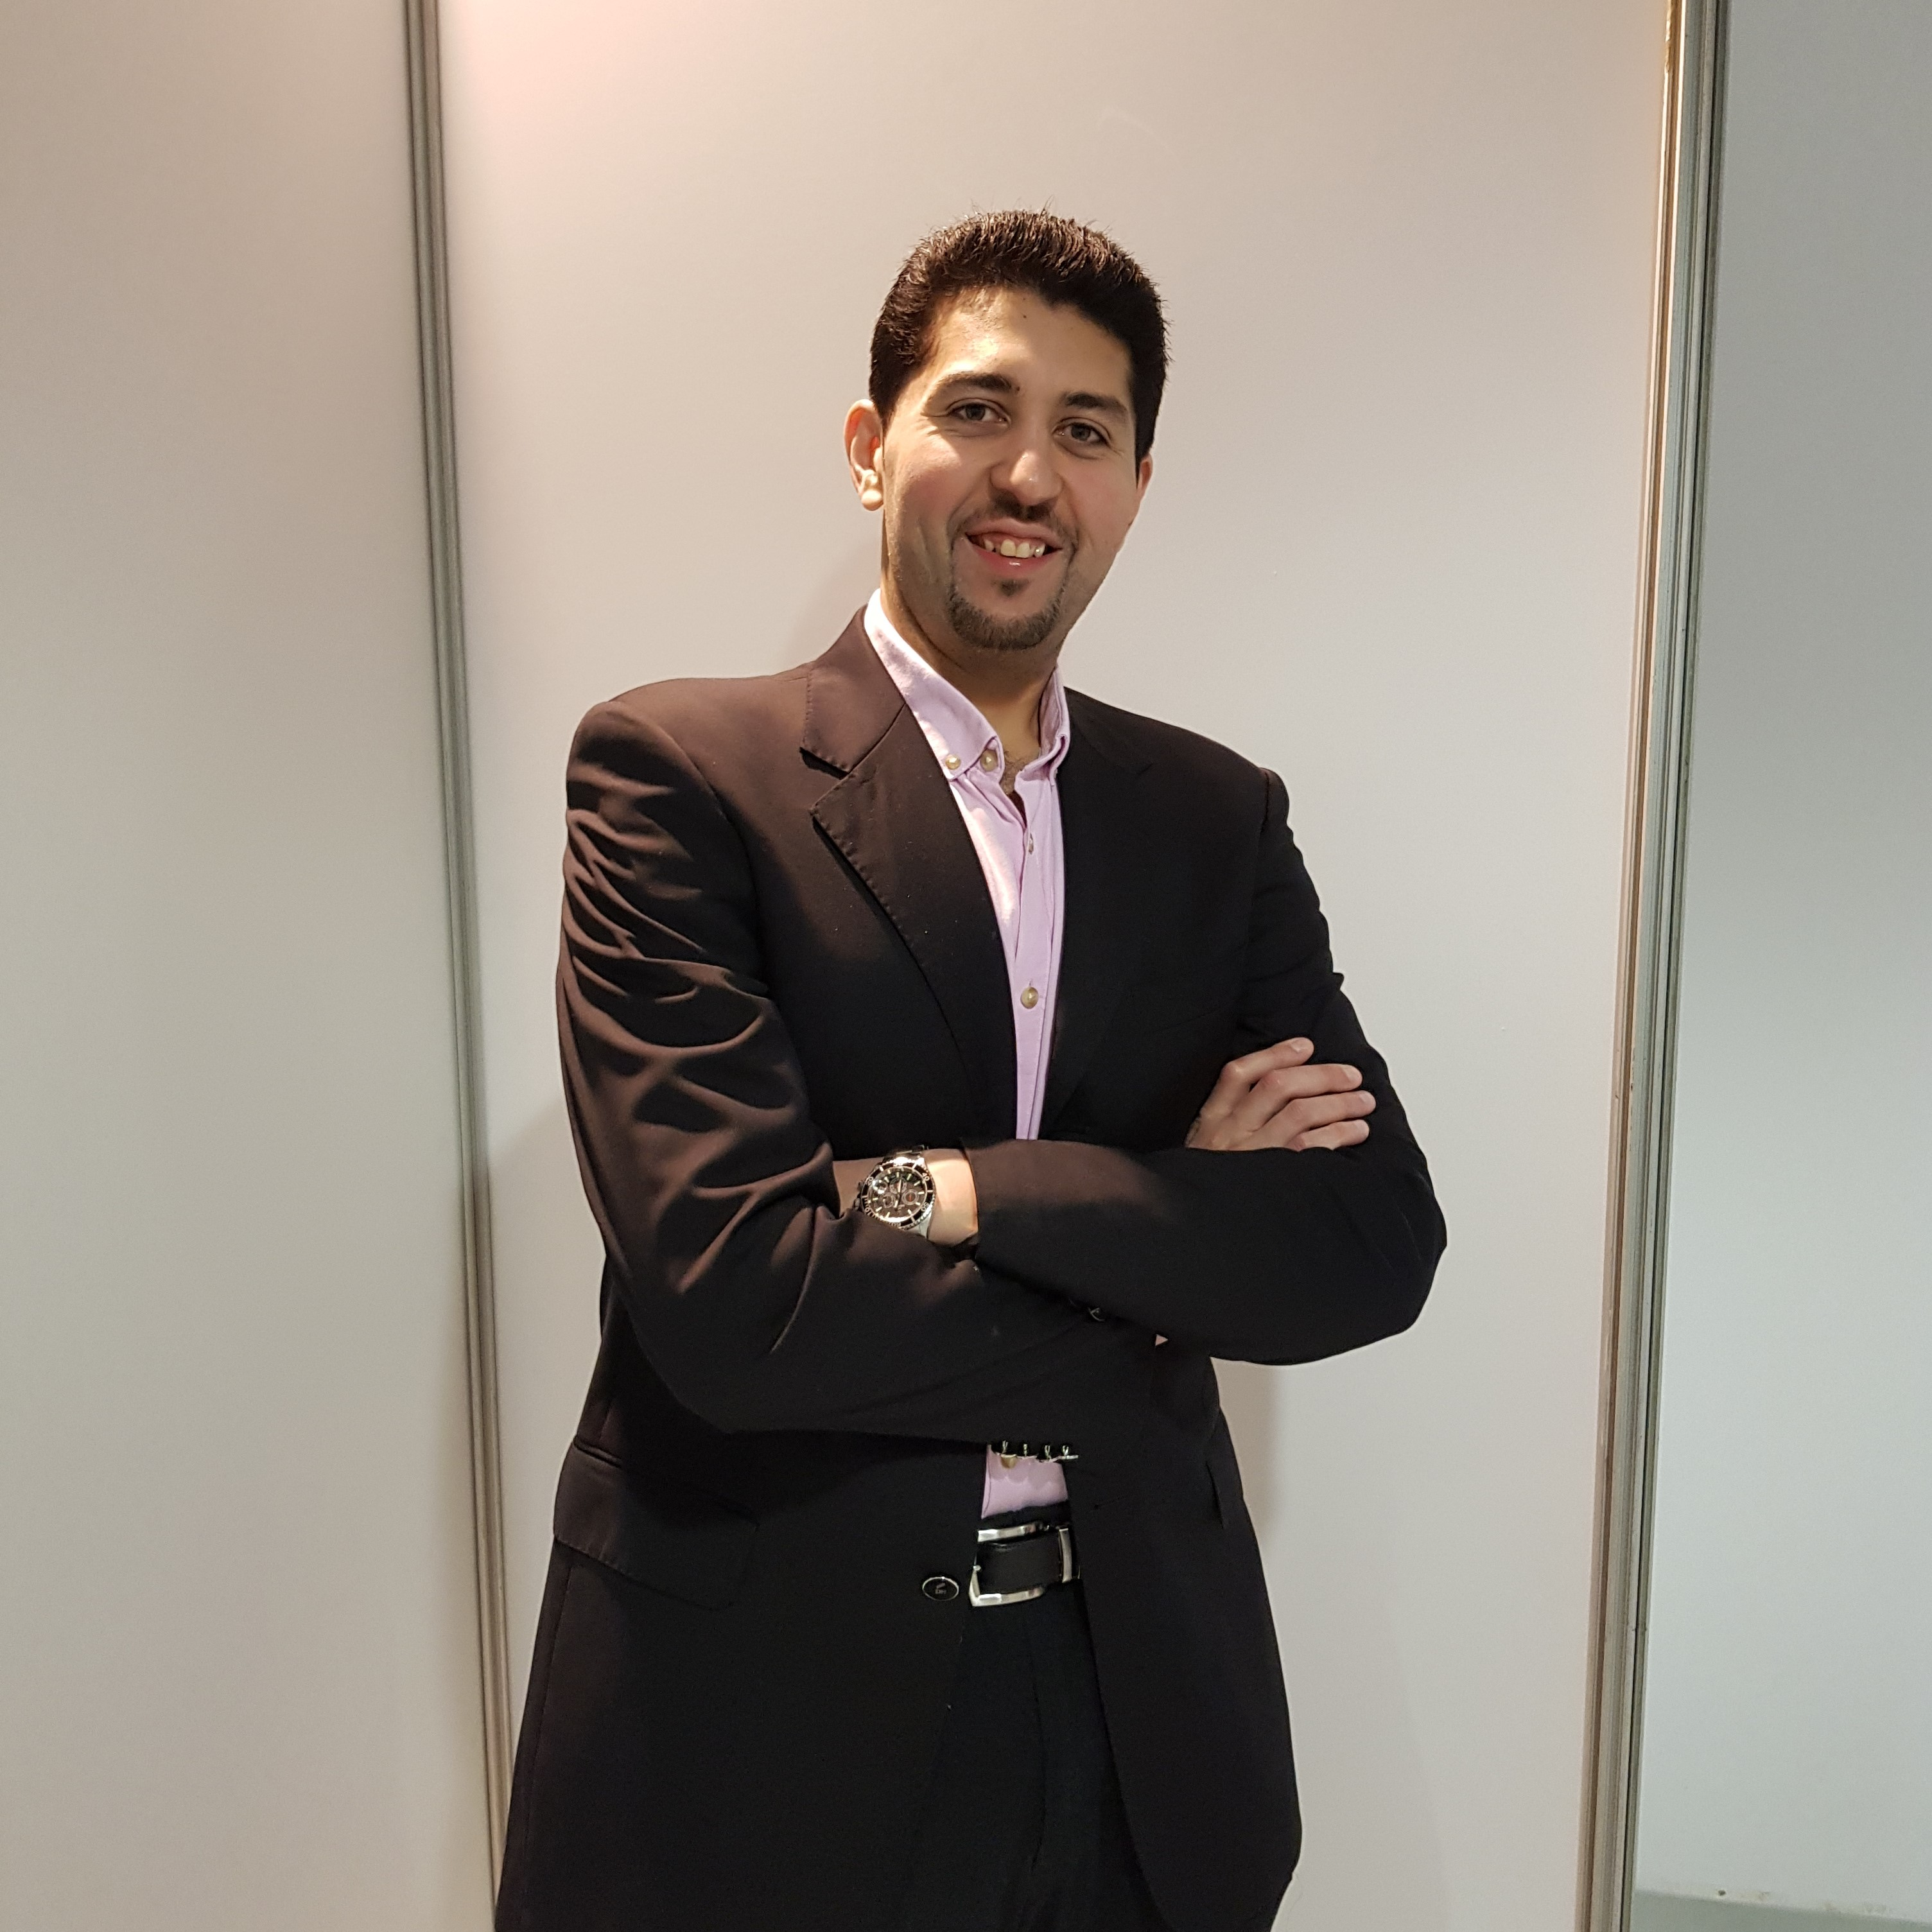 Essam Tawfik, former Pre-sessional English student